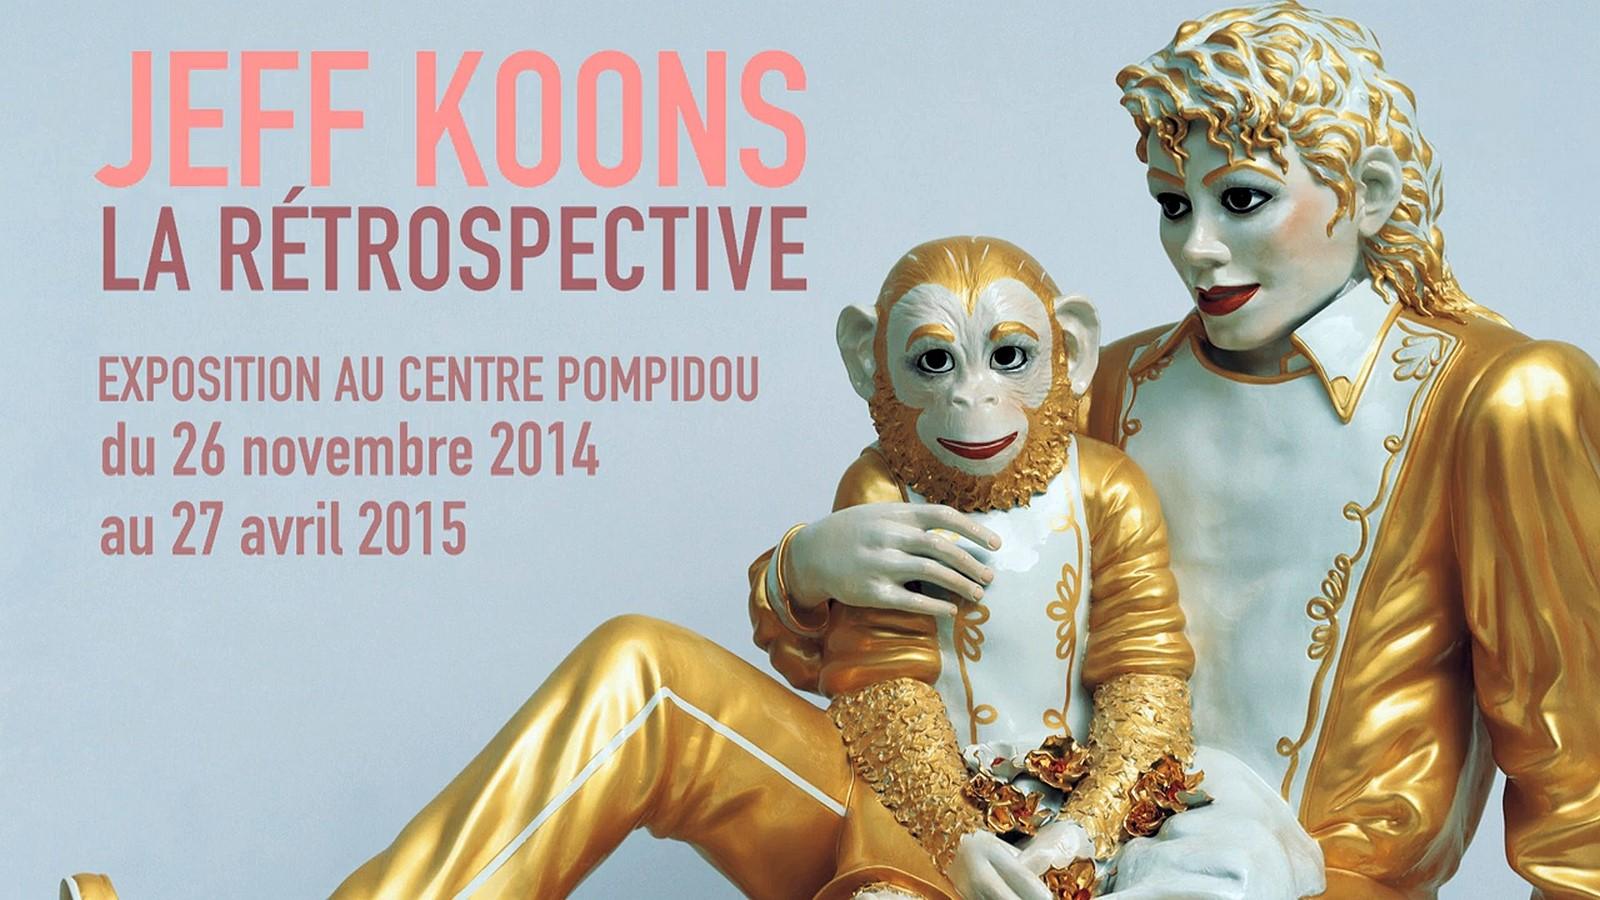 [Critique Expo] Jeff Koons